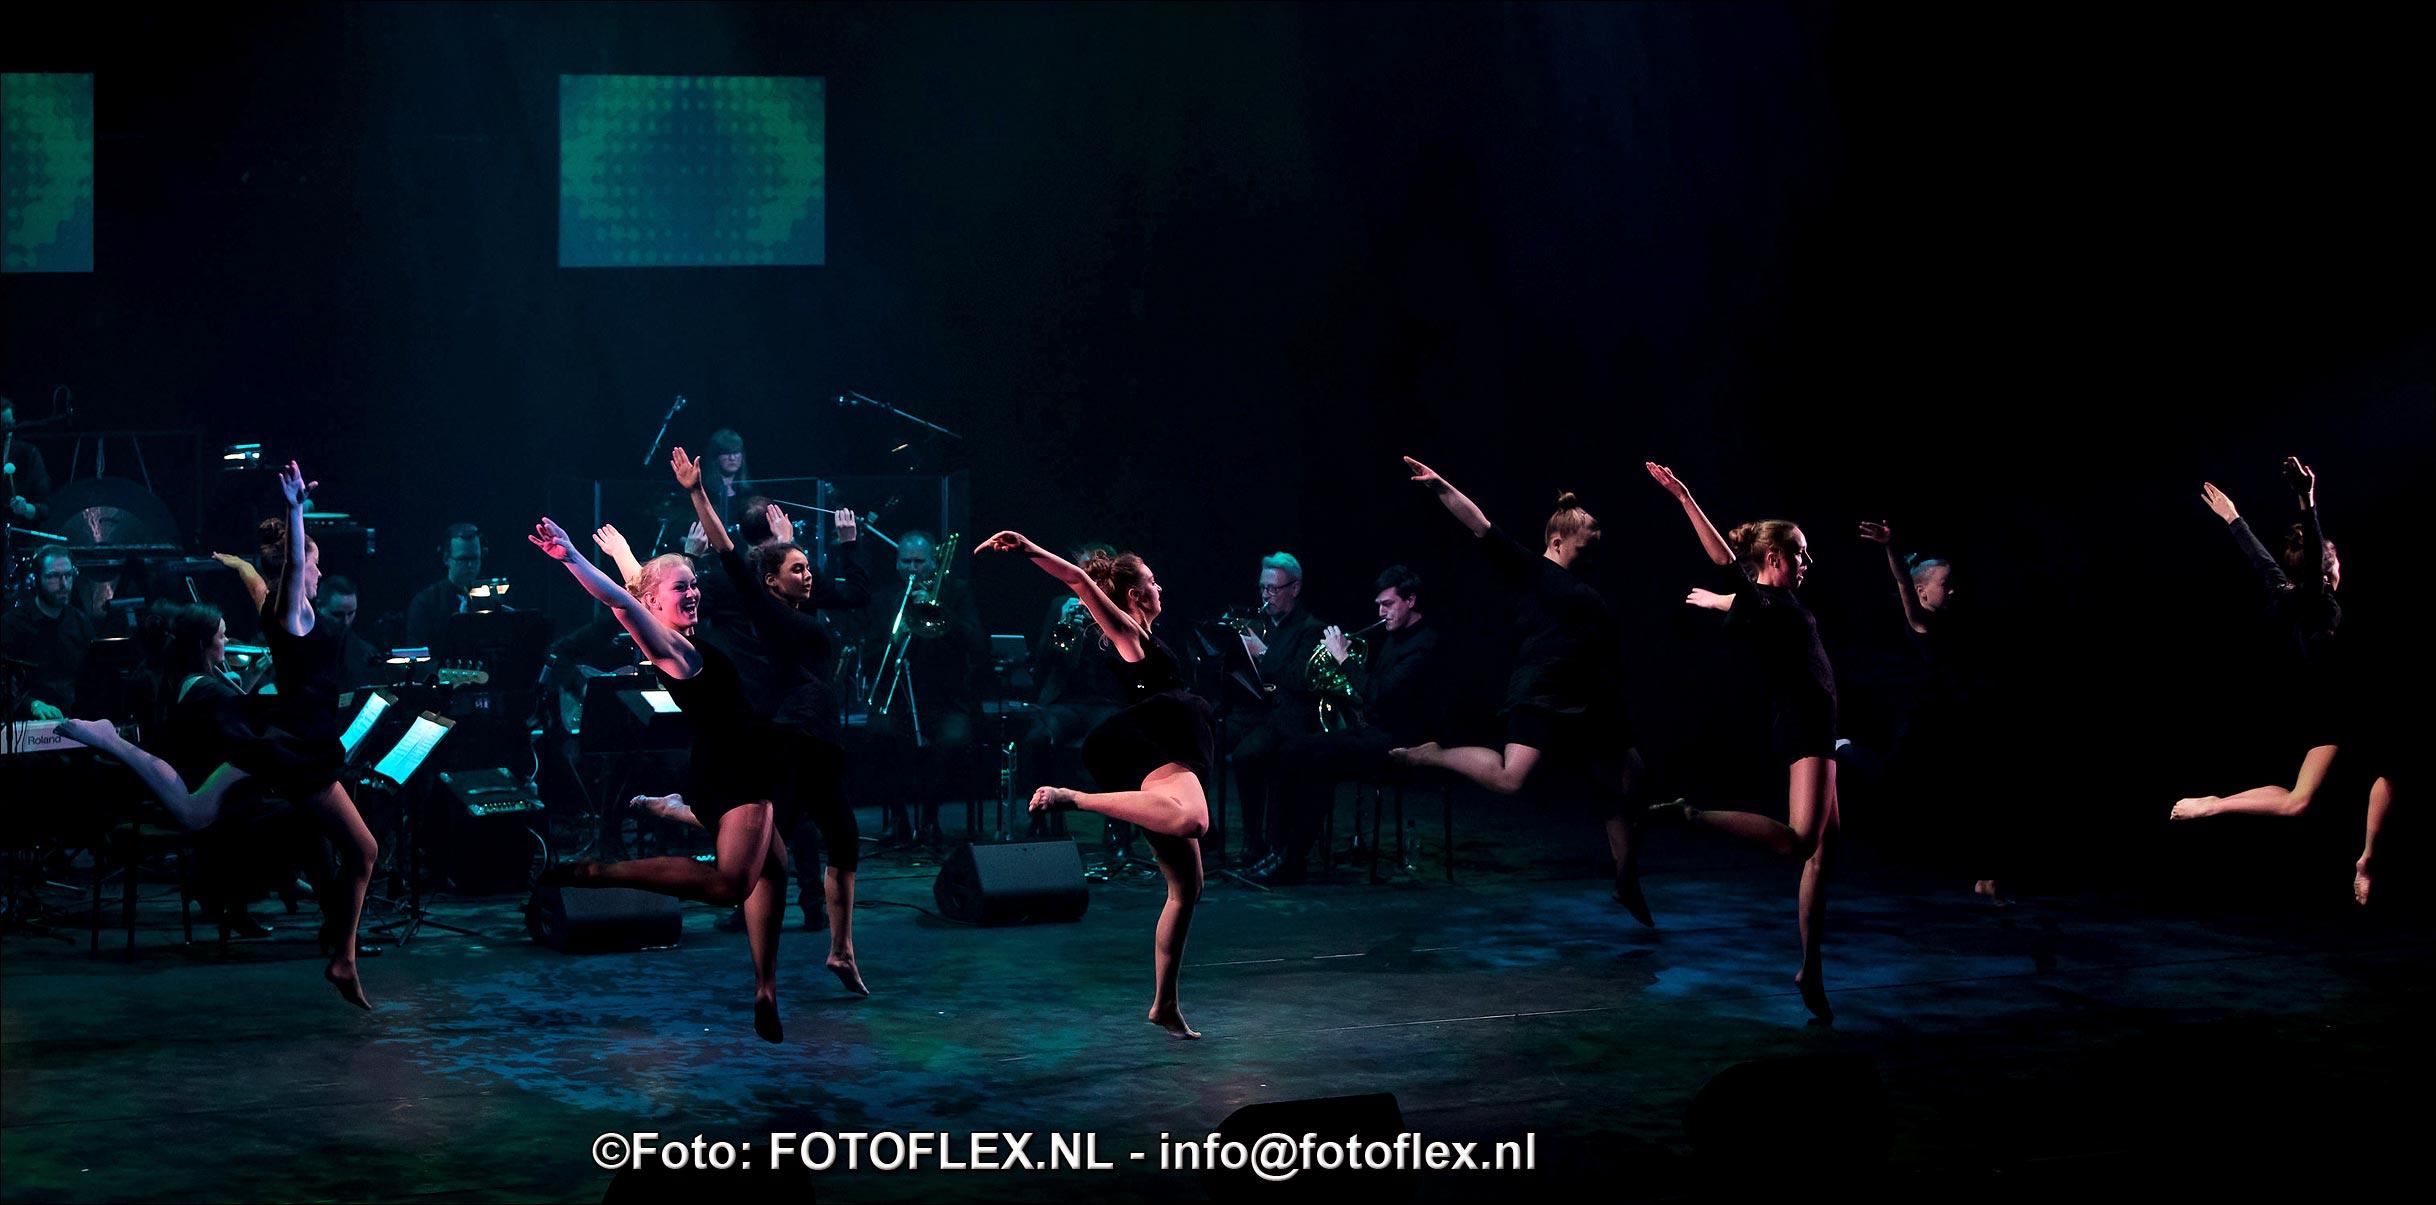 0553-CopyrightFOTOFLEX.NL07012020